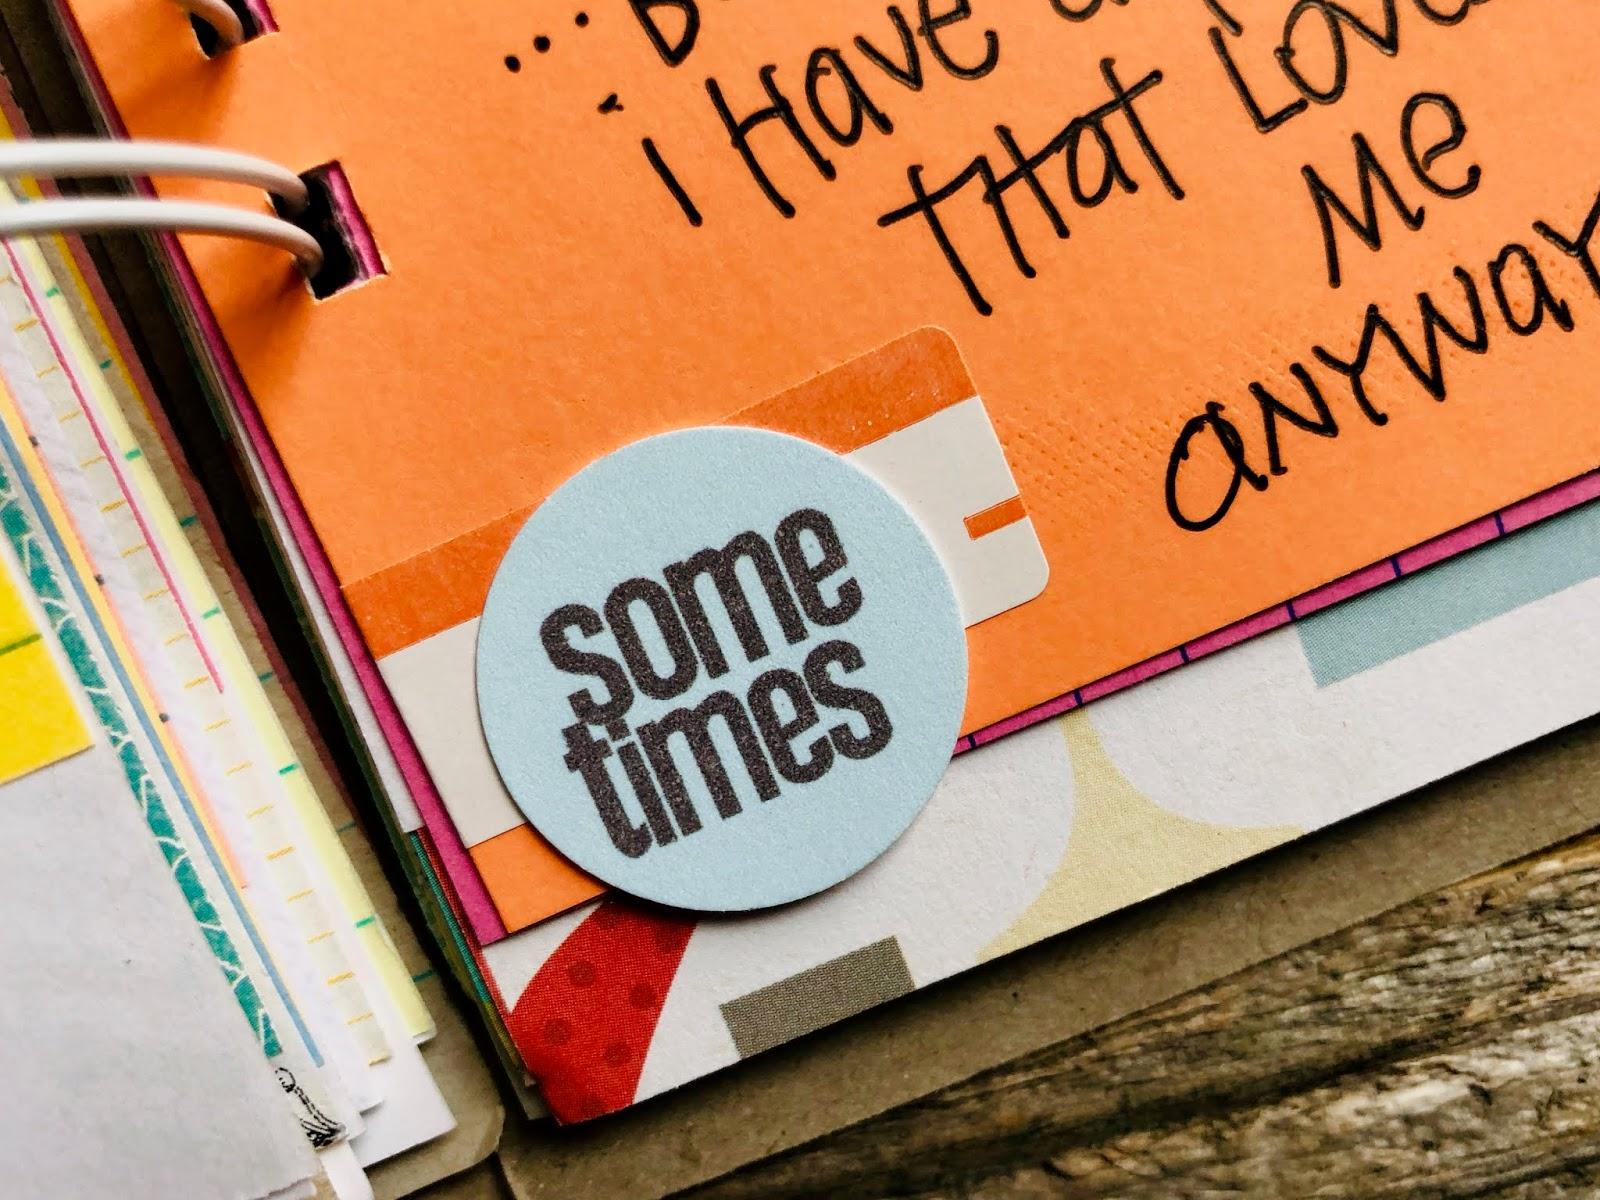 #gratitude journal #gratitude #on my mind #printables #printable #thankful journal #journaling #i am thankful #sometimes